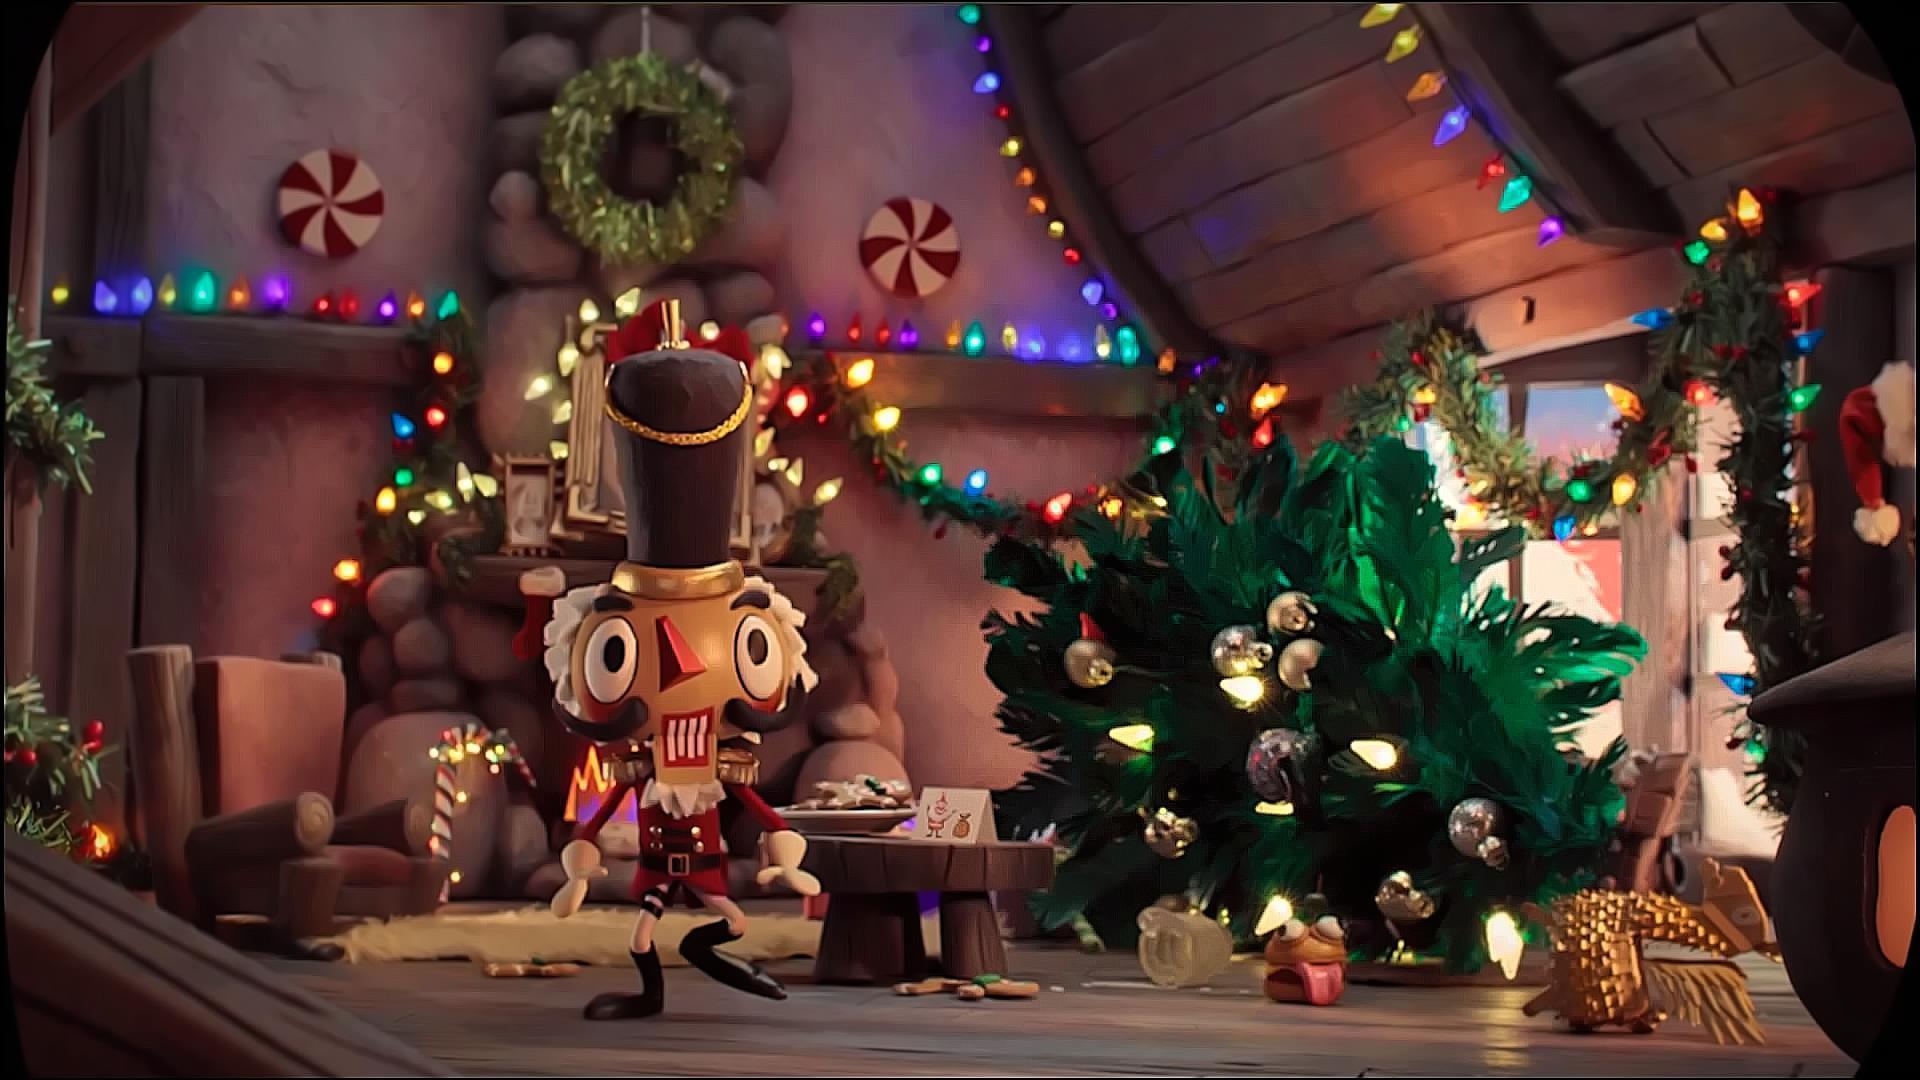 Christmas Fortnite Battle Royale Wallpapers Top Free Christmas Fortnite Battle Royale Backgrounds Wallpaperaccess